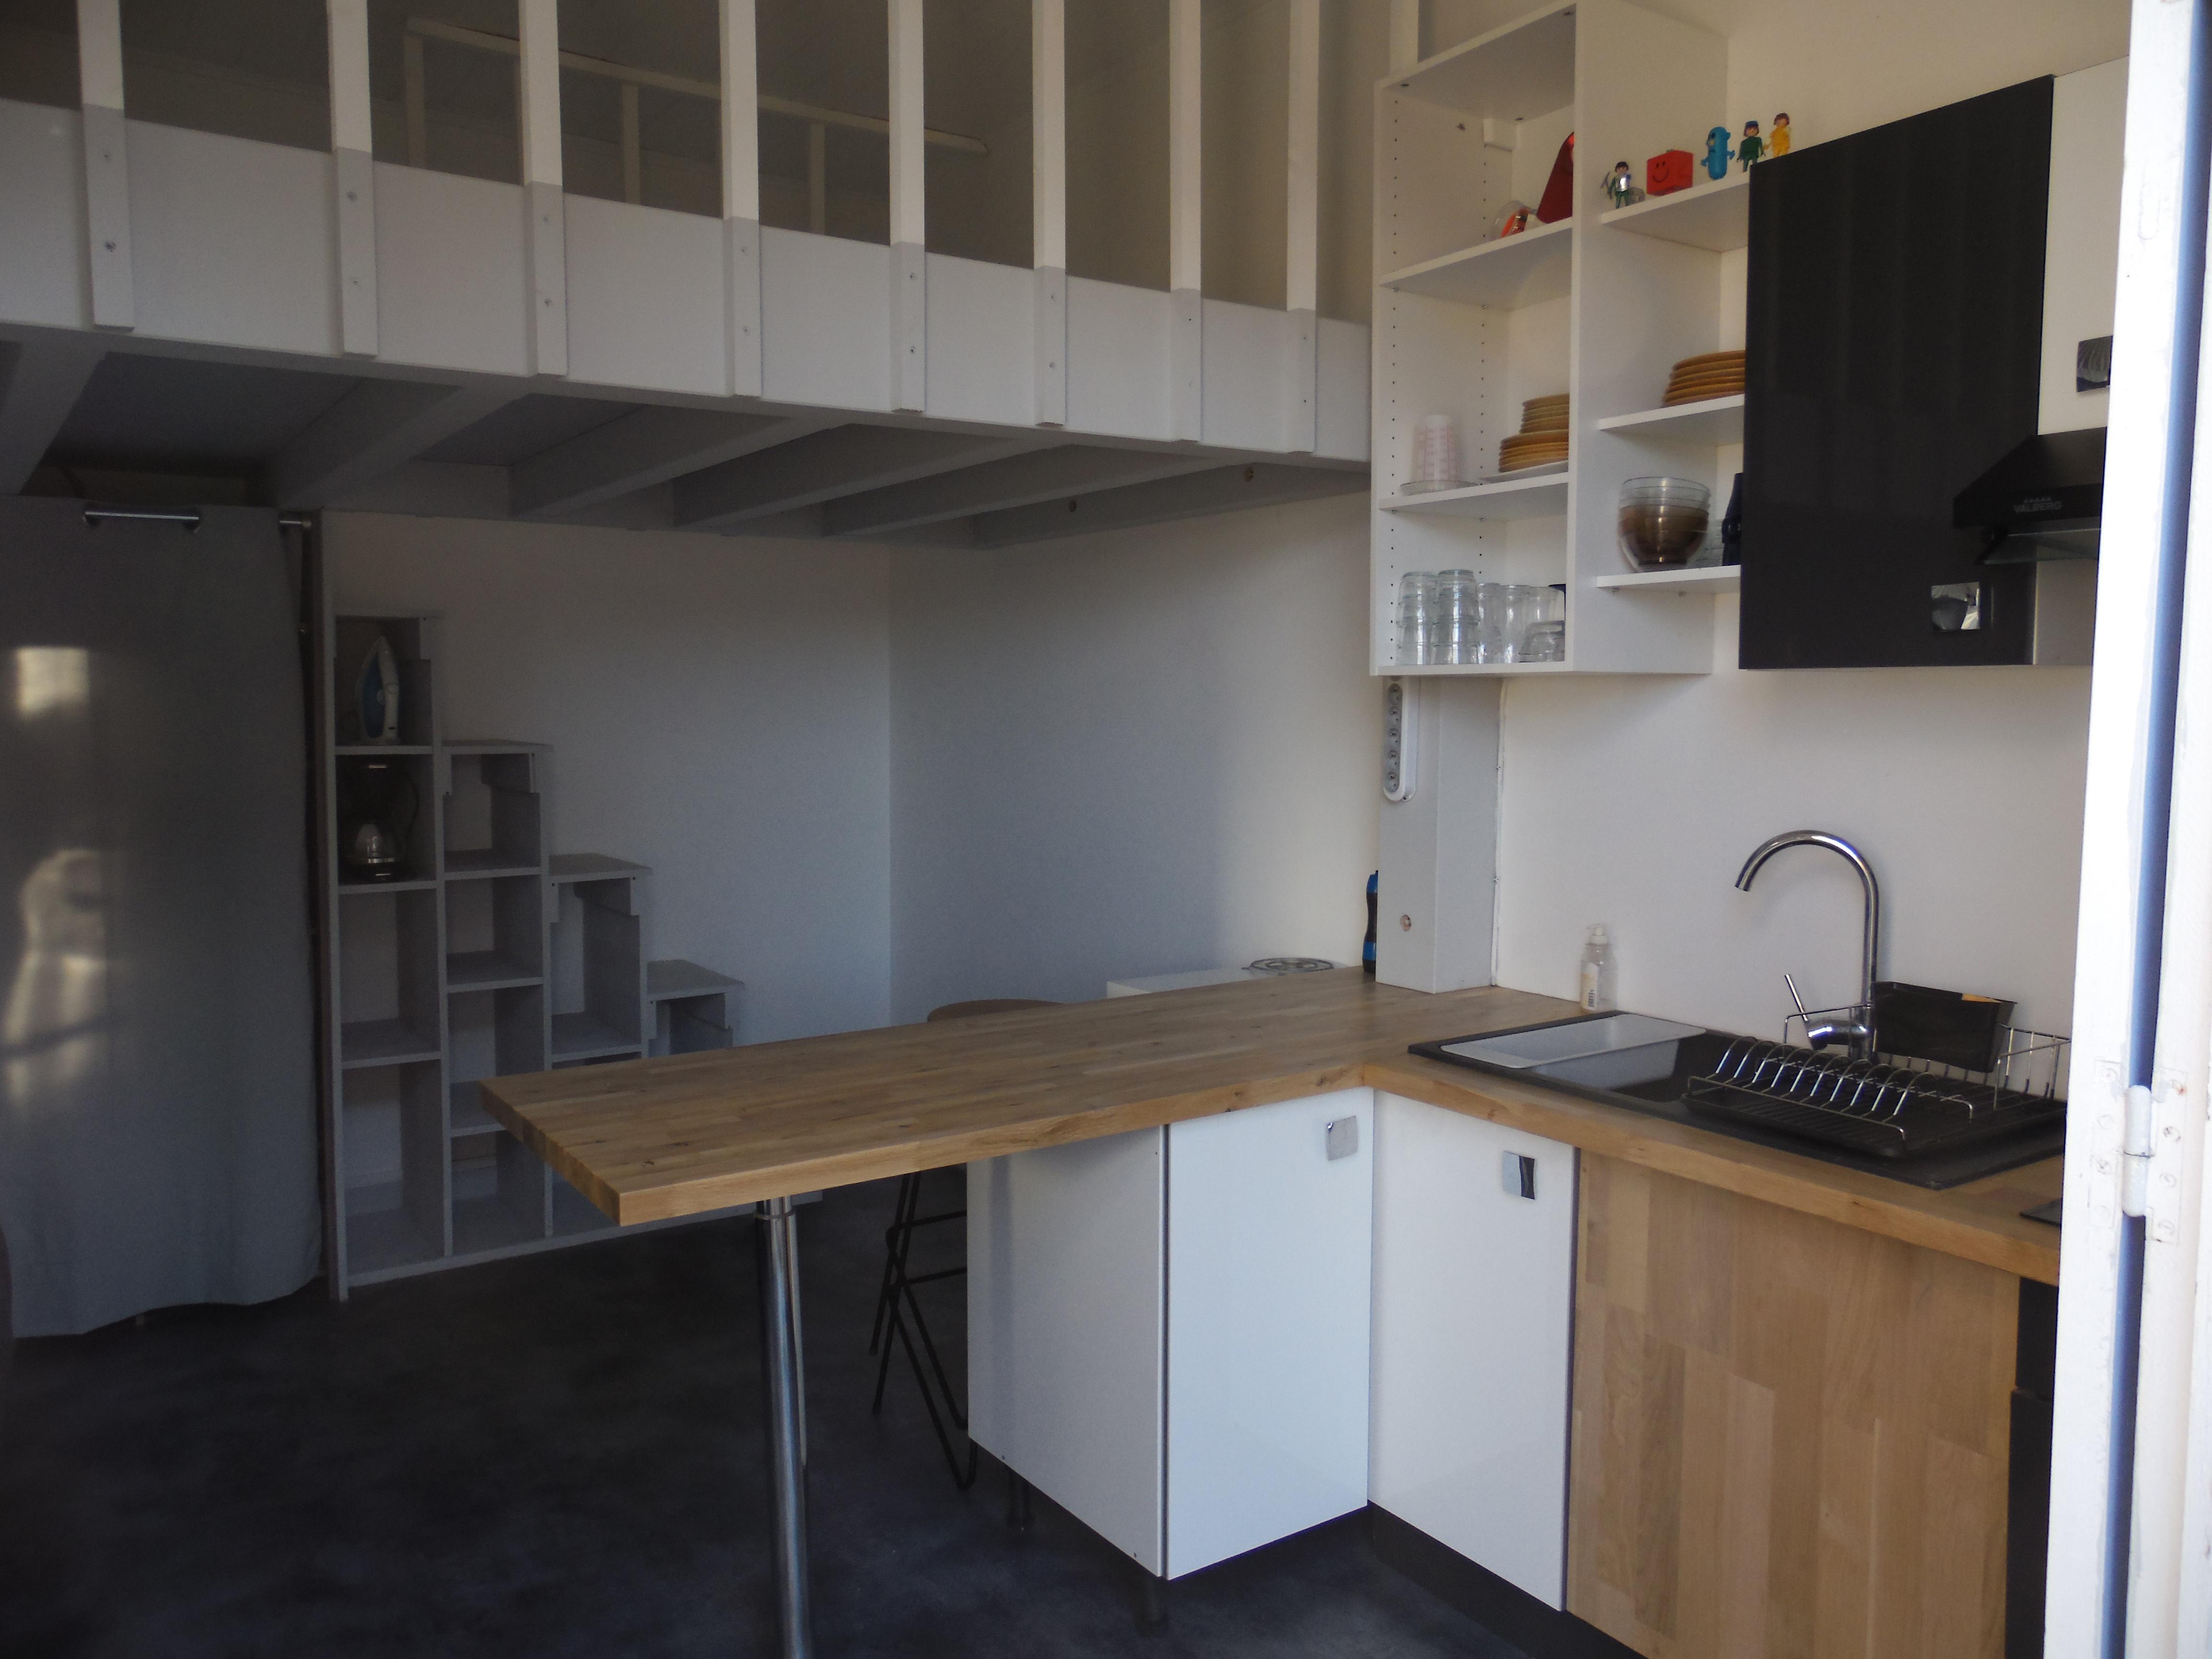 Location de vacances Studio mezzanine à Mimizan-Plage